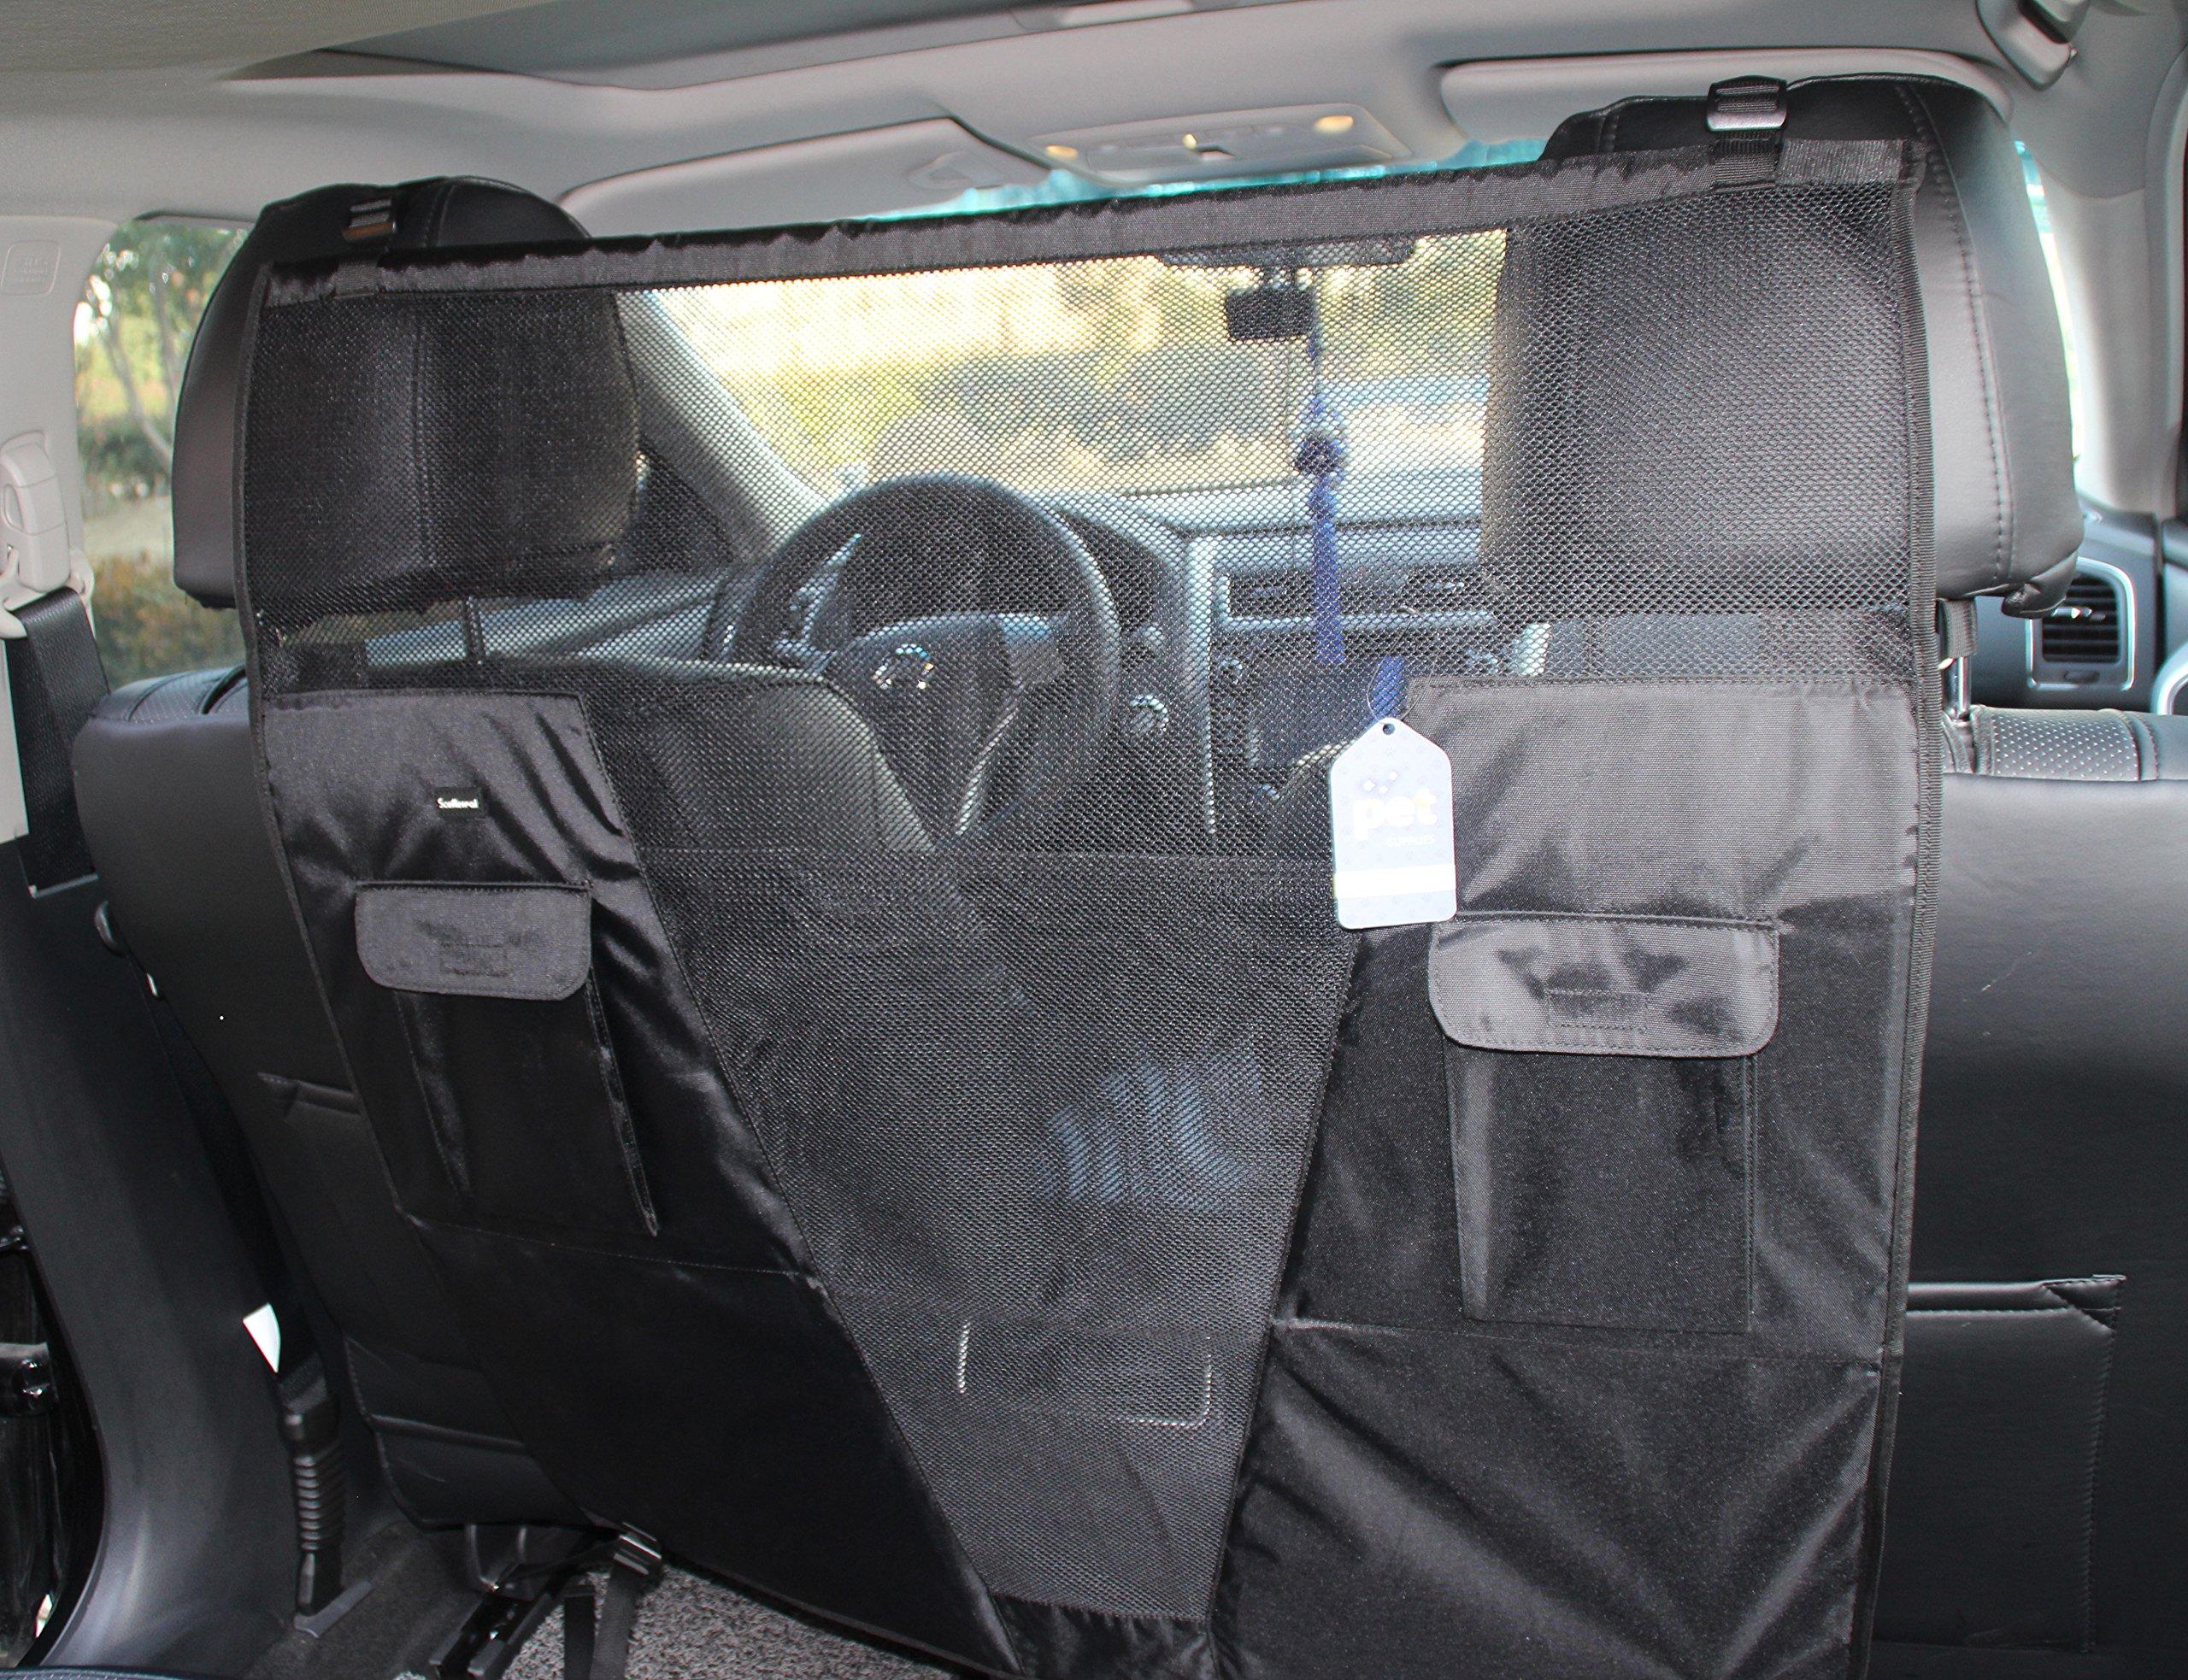 SCENEREAL Pet Dog Net Vehicle Barriers - Backseat Mesh for Cars Vehicles SUV Vans Trucks Adjustable Frontseat Belts Safe & Durable by SCENEREAL